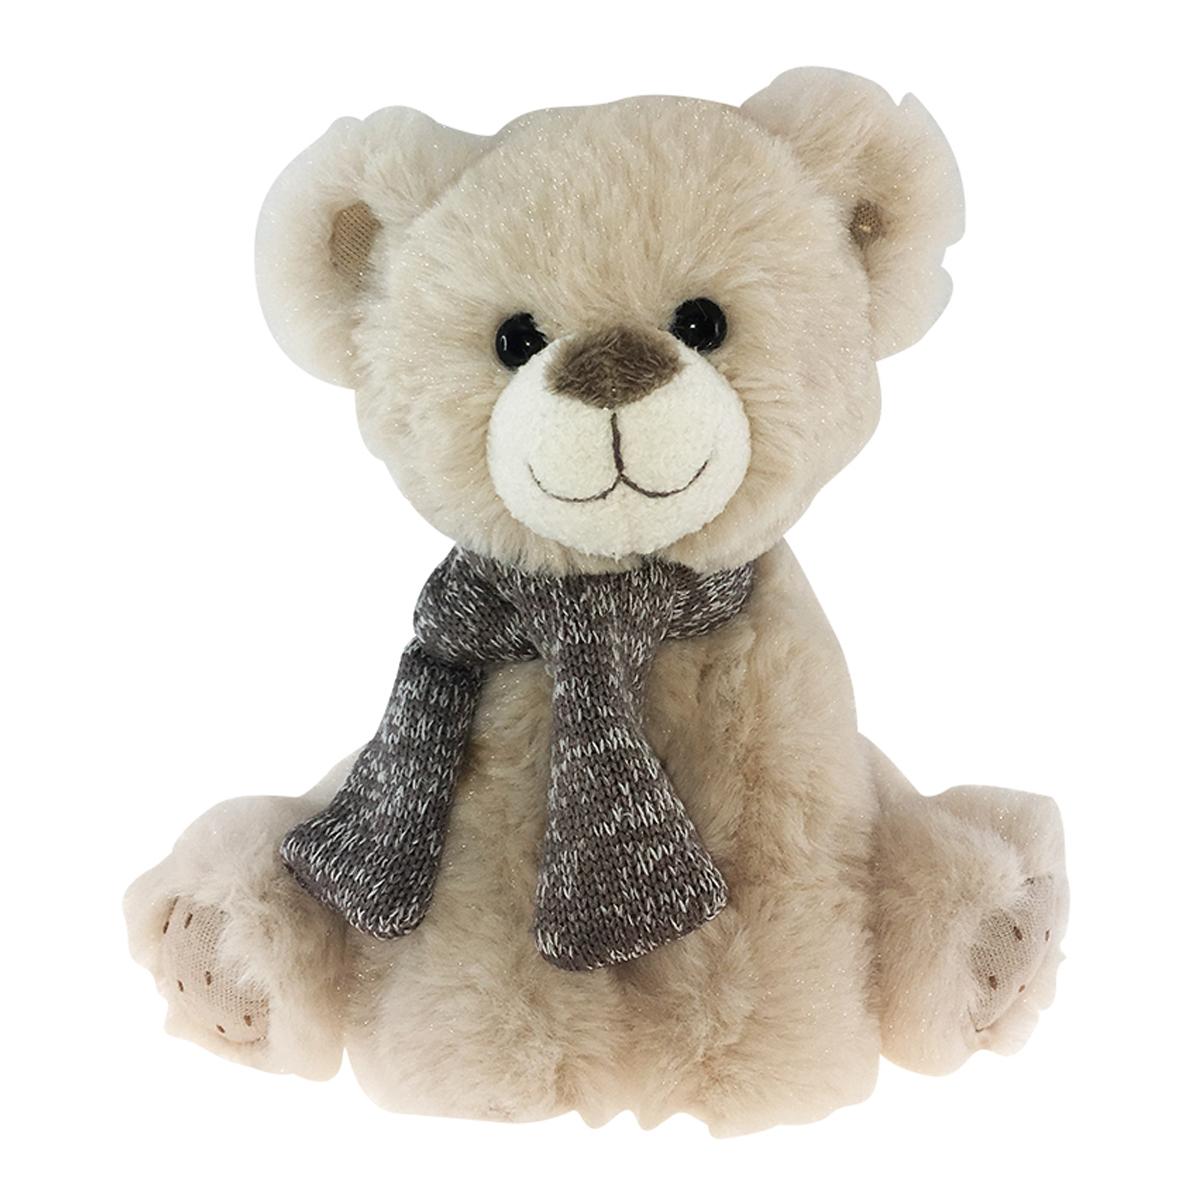 Peluche design \'Teddy Bear\' beige taupe - 20 cm - [Q3910]